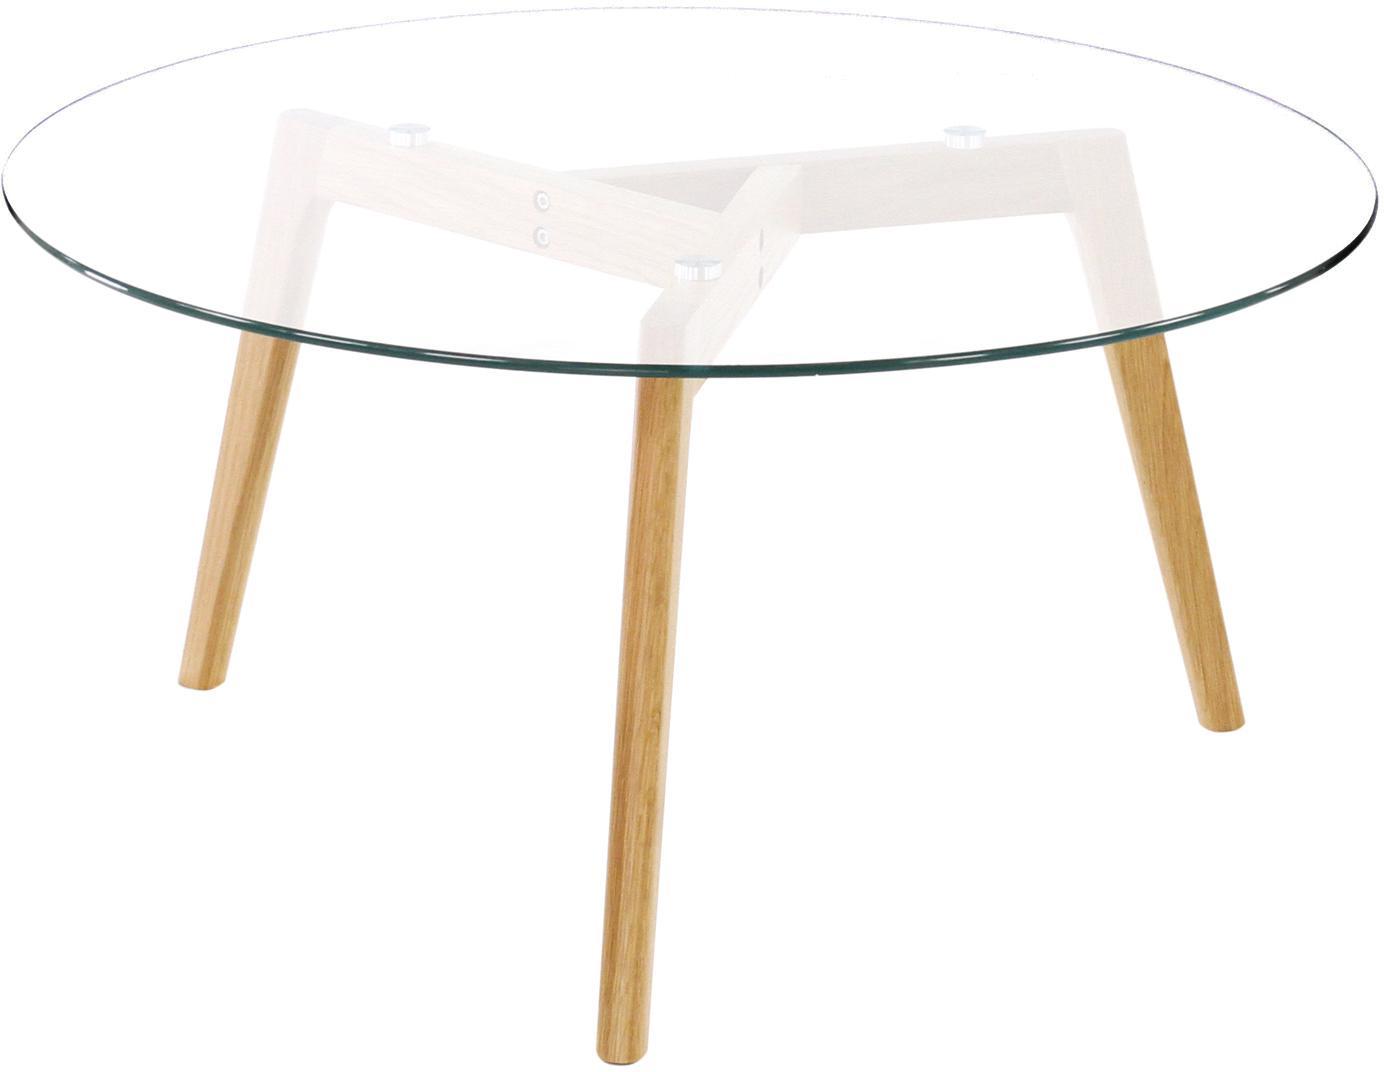 Ronde salontafel Bloom met glazen tafelblad, Tafelblad: glas, Transparant, Ø 90 x H 40 cm